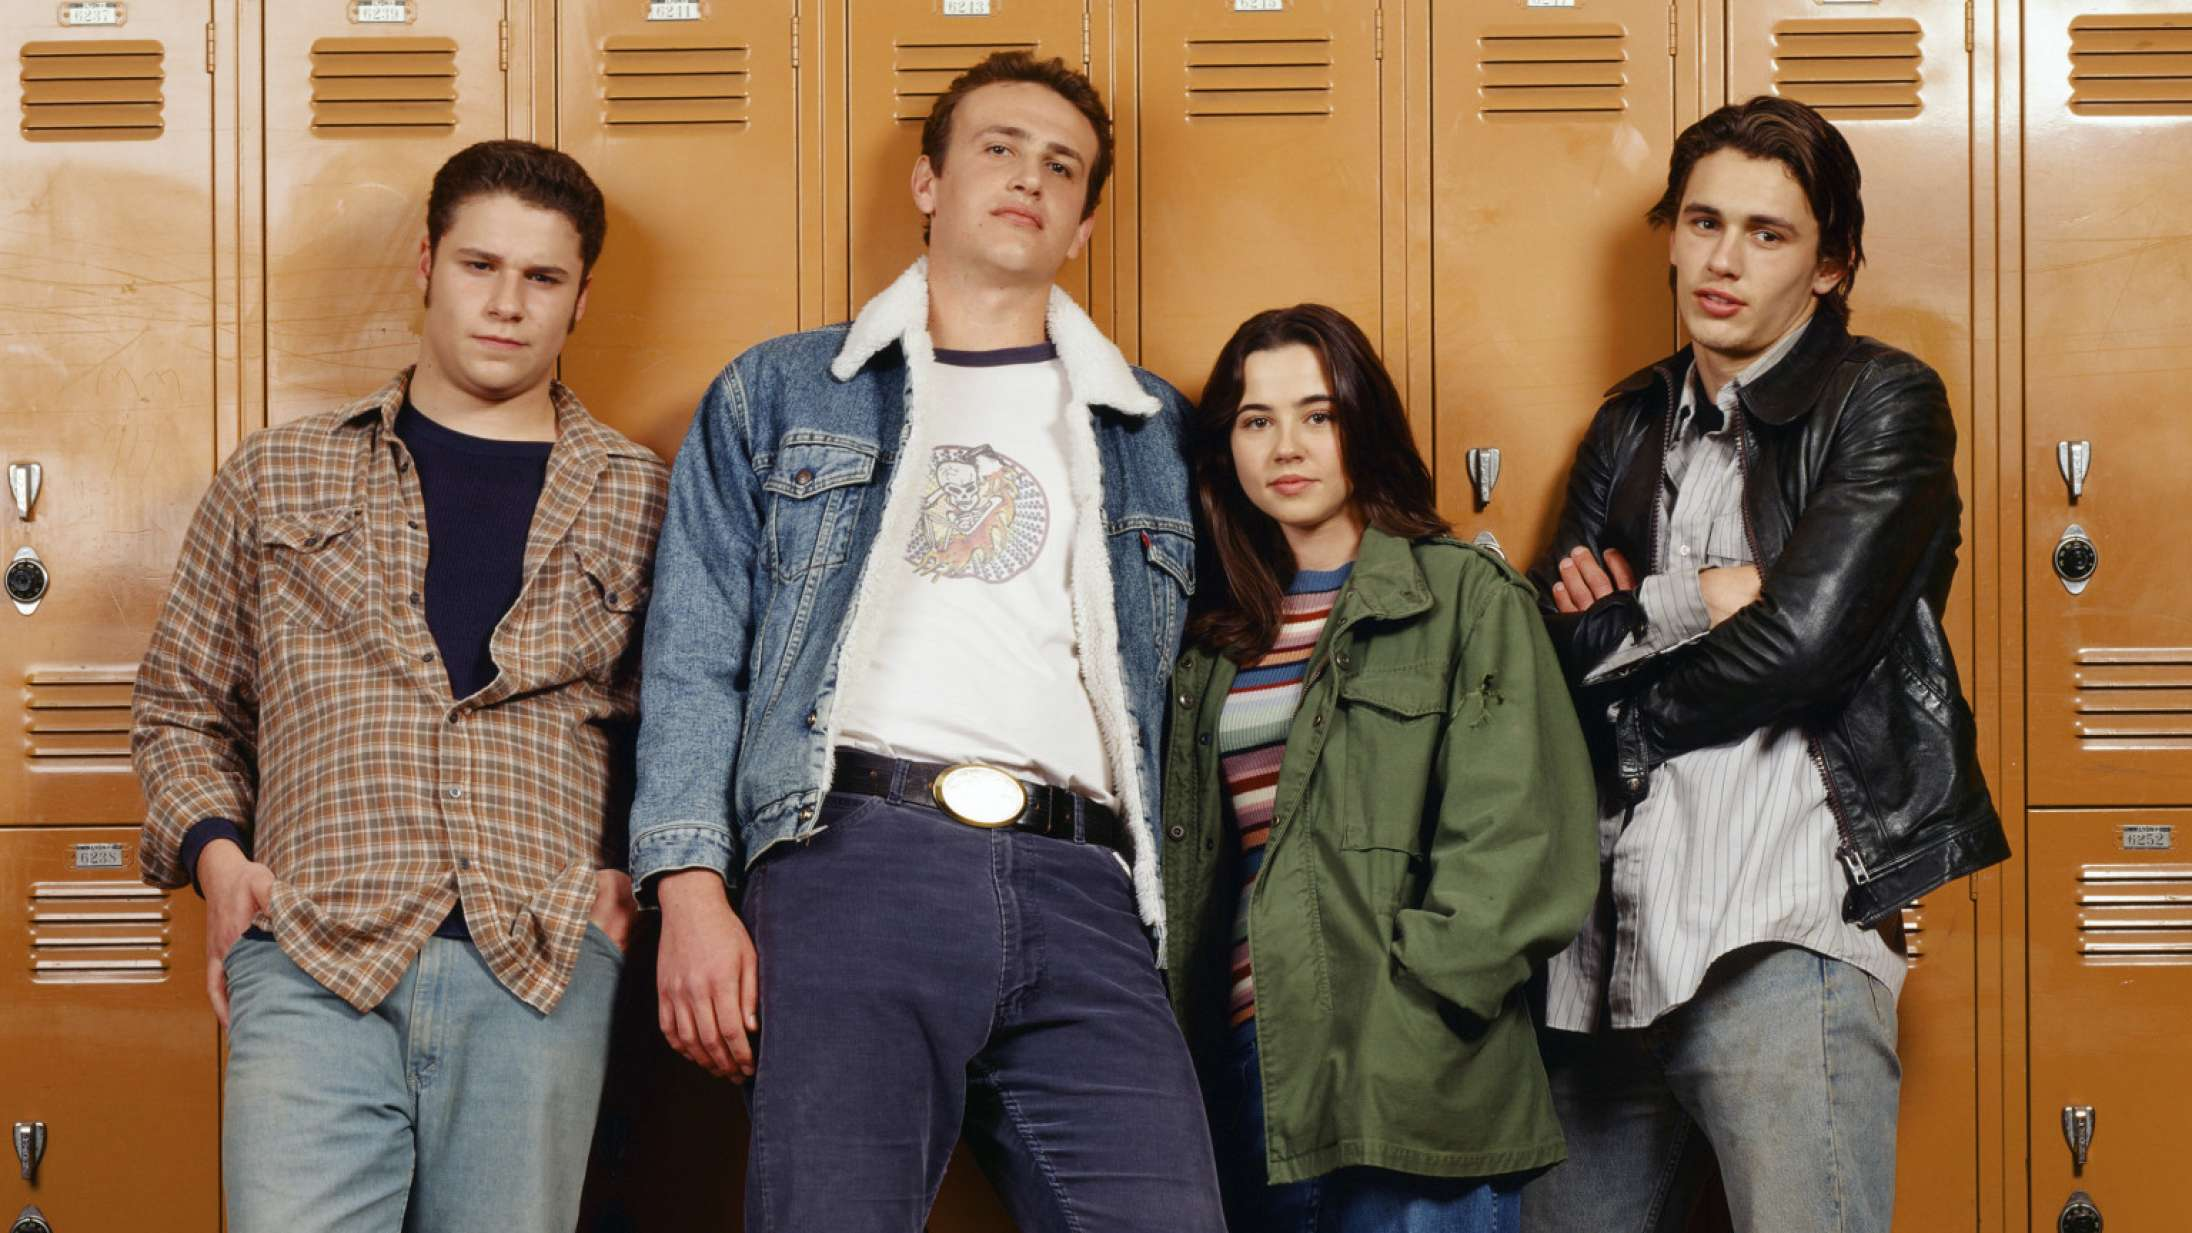 Verdens bedste highschool-serie kan igen ses i Danmark